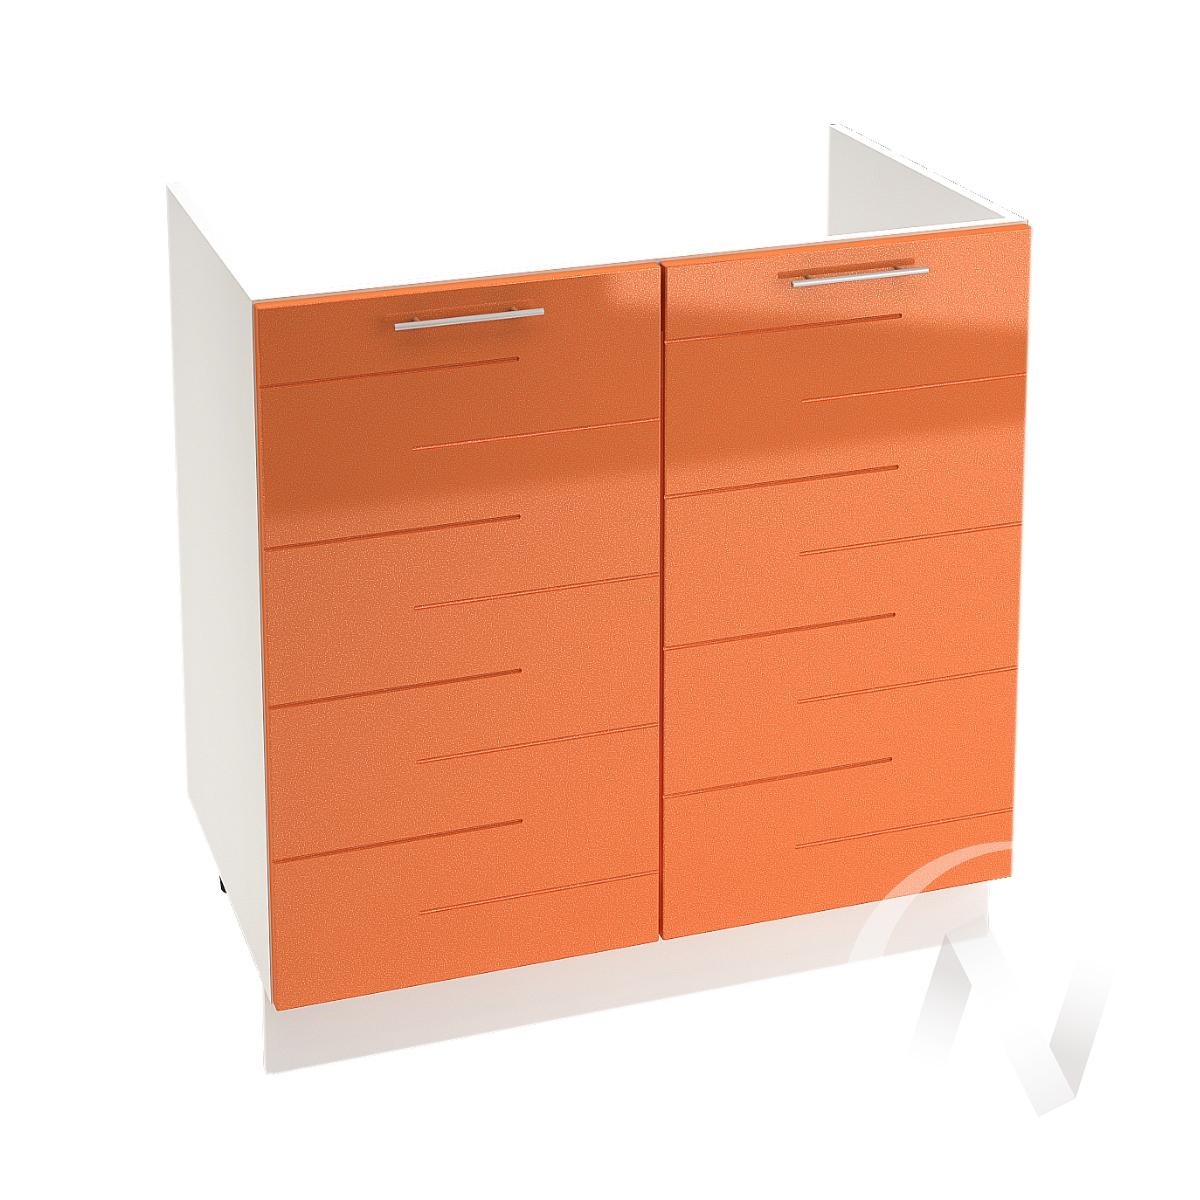 "Кухня ""Техно"": Шкаф нижний под мойку 800, ШНМ 800 новый (корпус белый)"